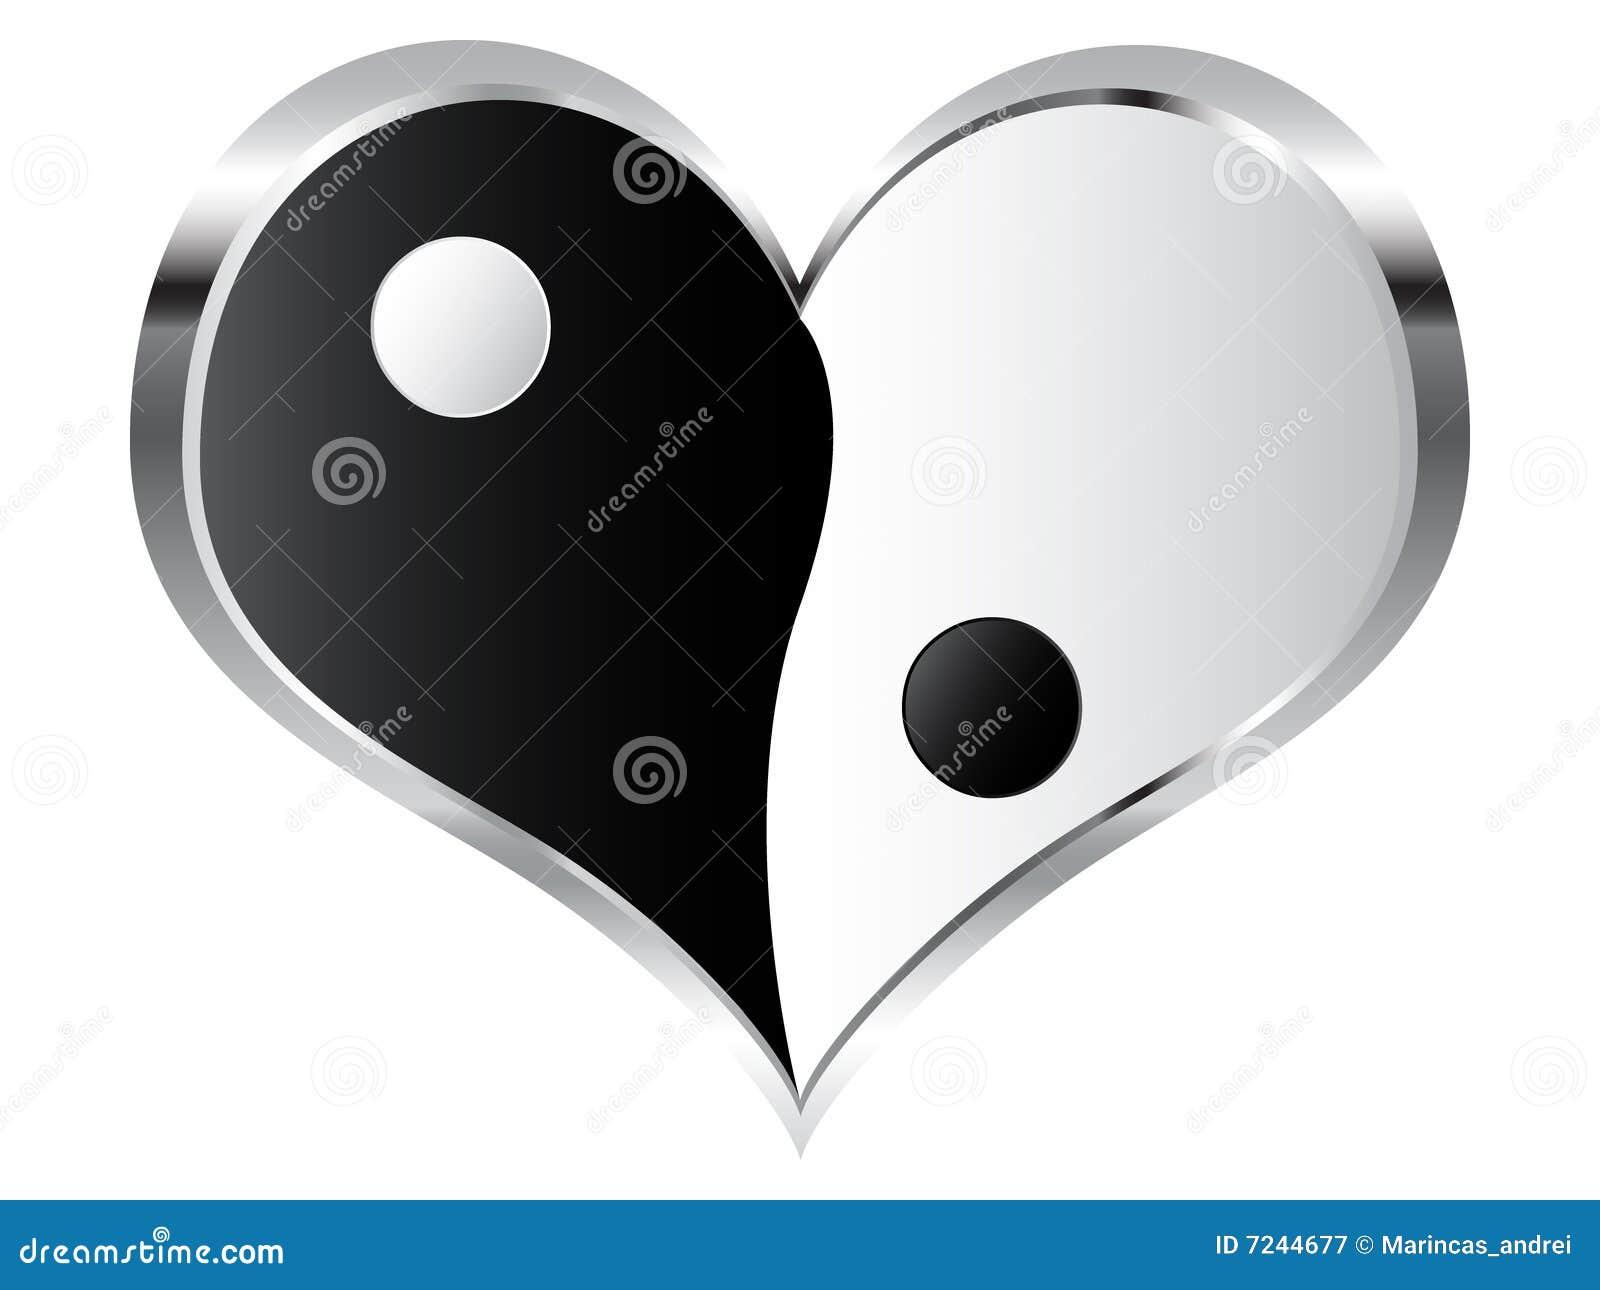 Yin and yang heart